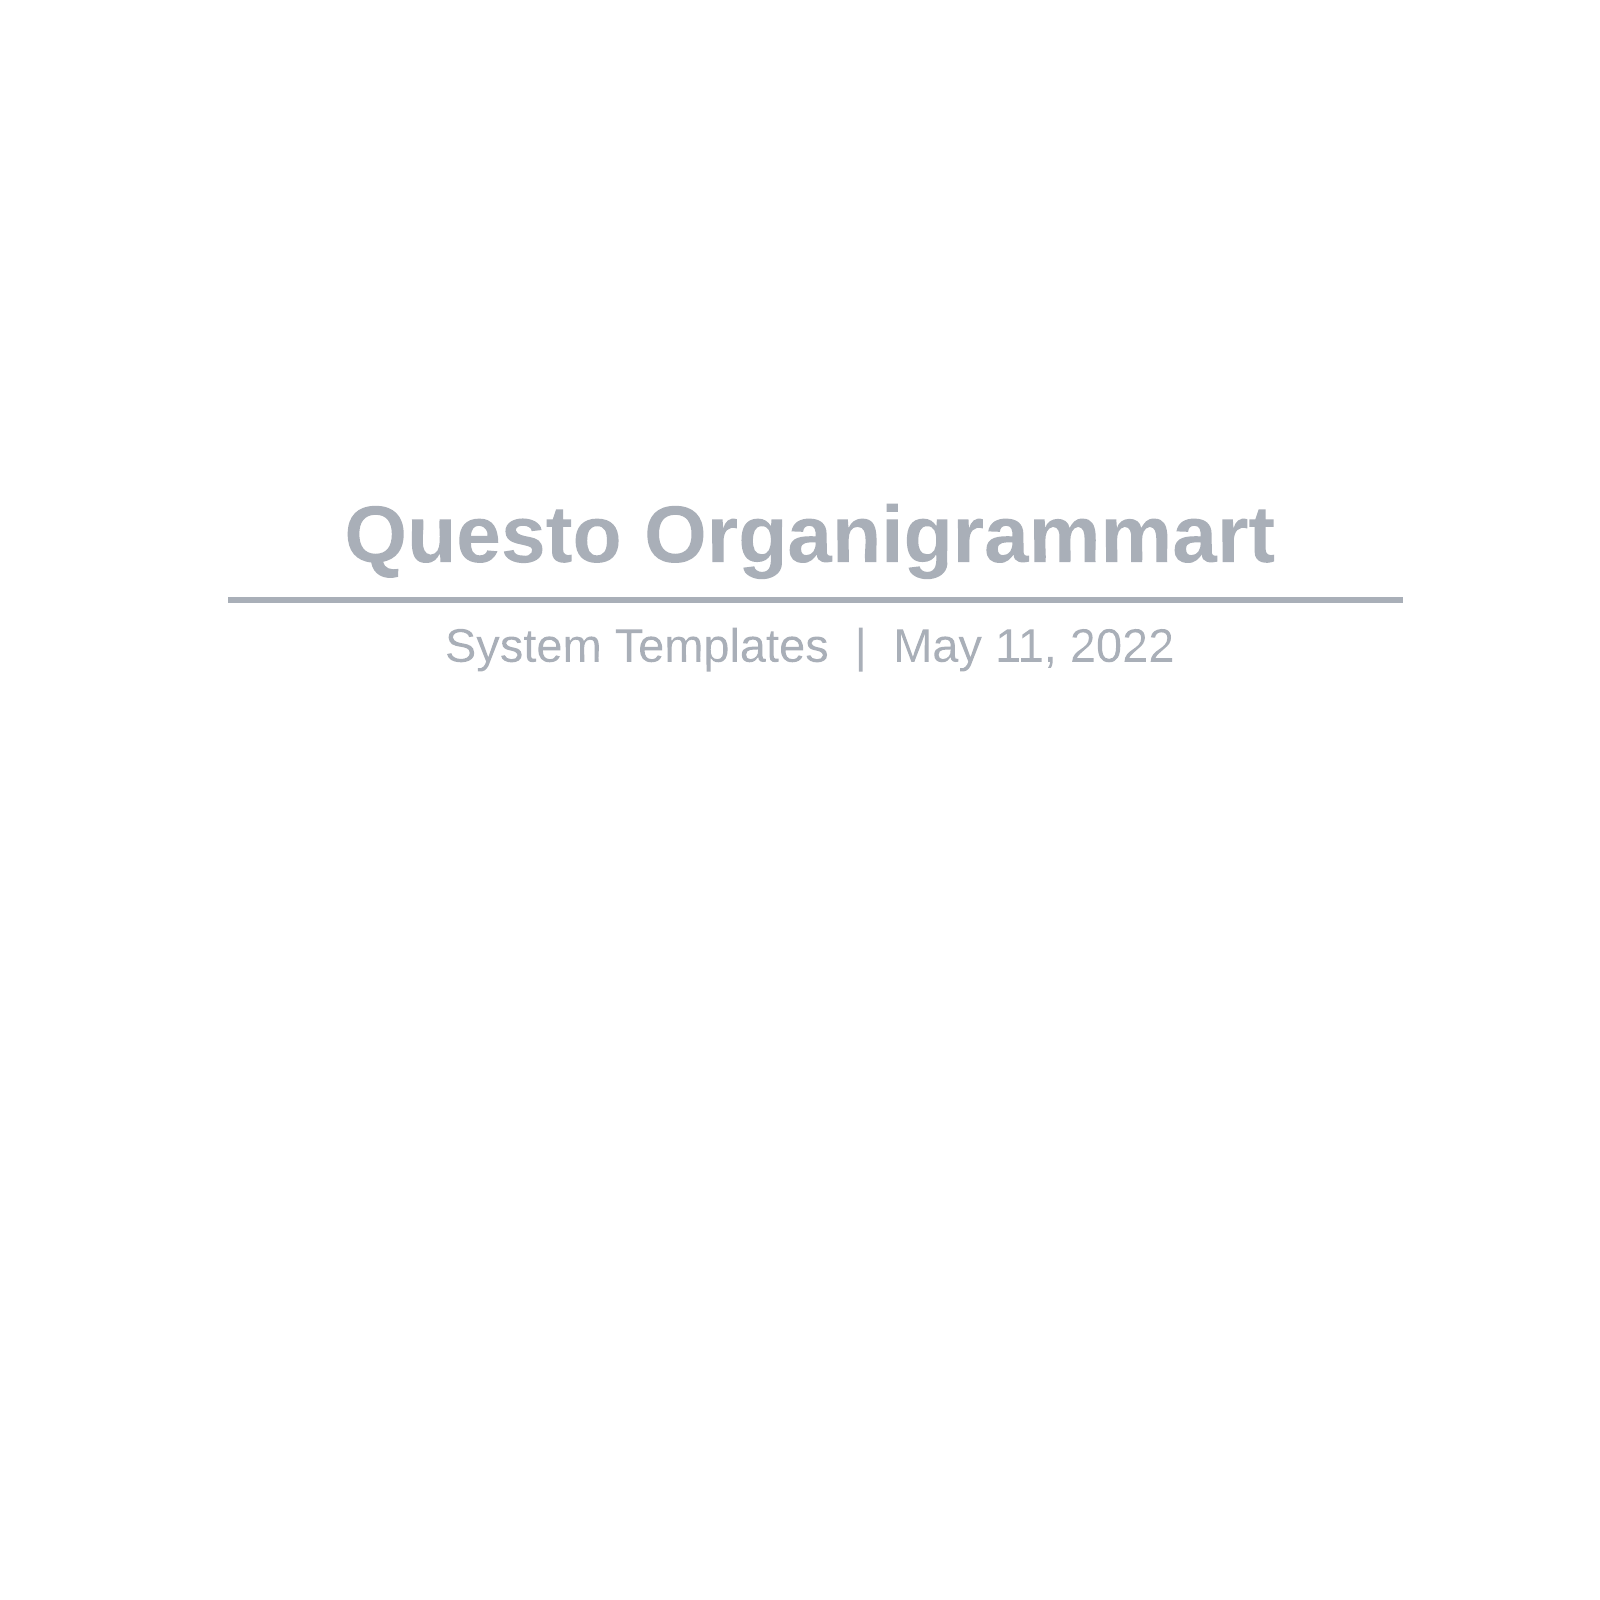 Questo Organigrammart